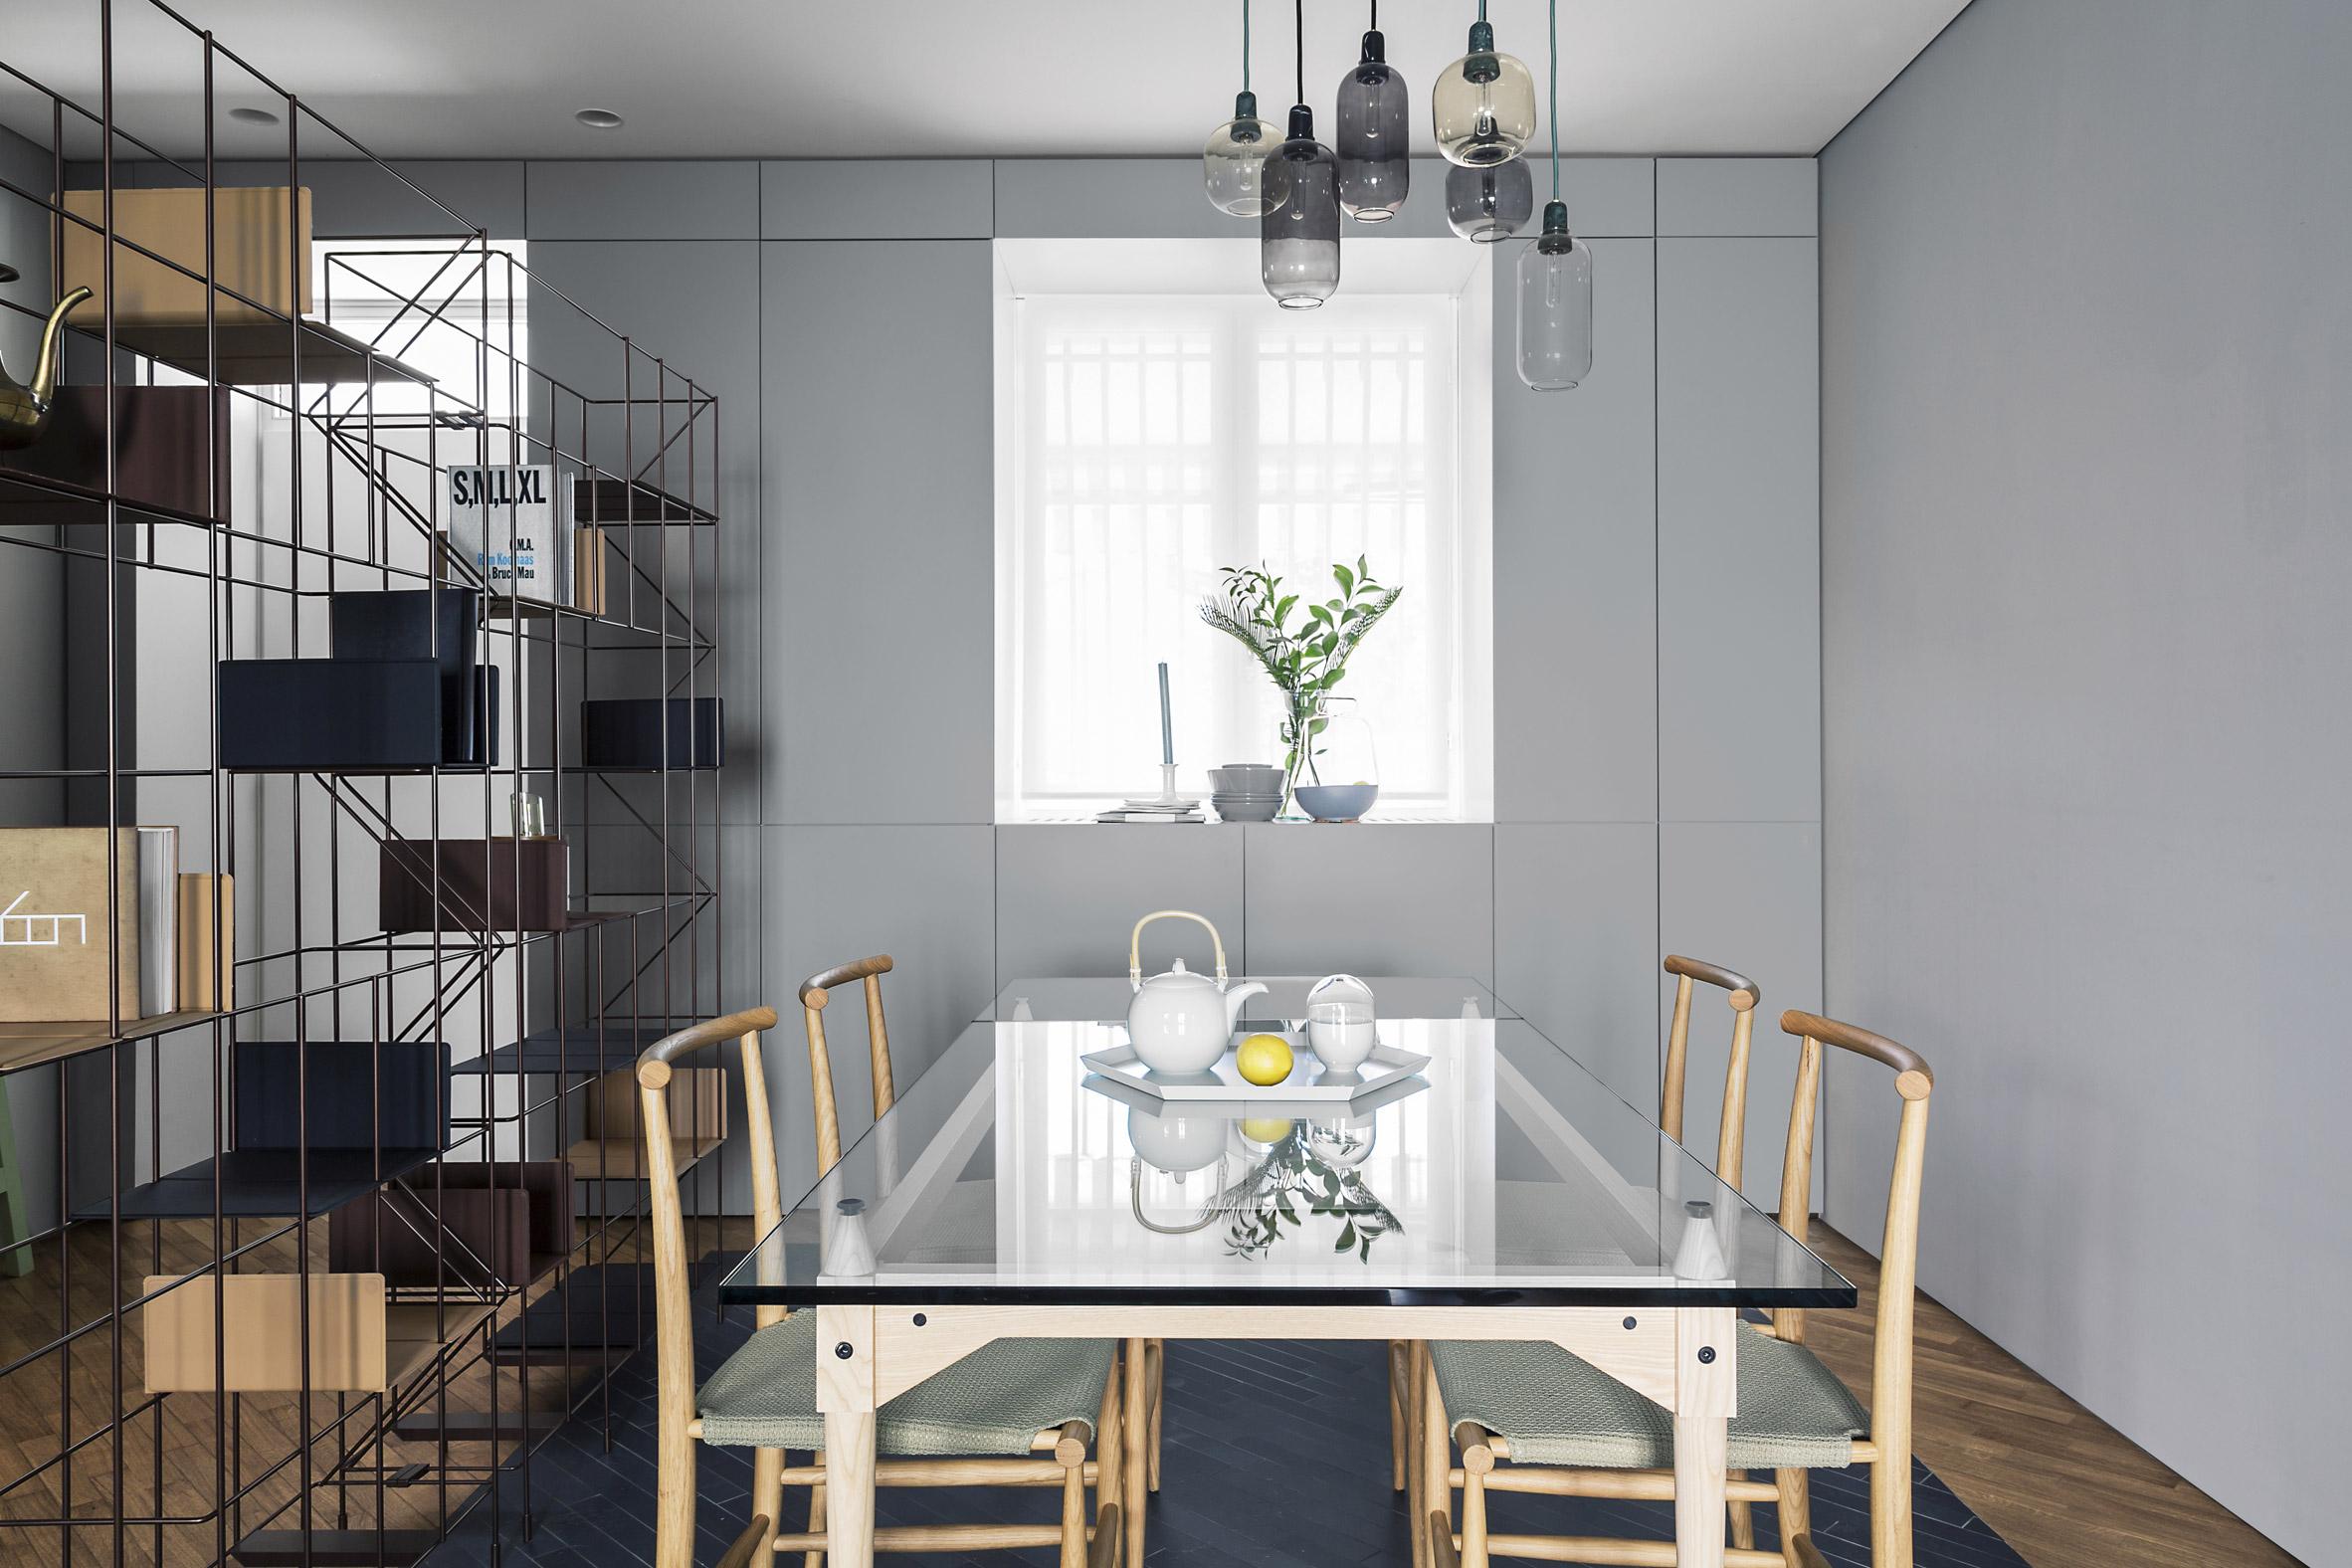 architecture-house-residential-design-studia-interiors-osnovadesign-osnova-poltava_04